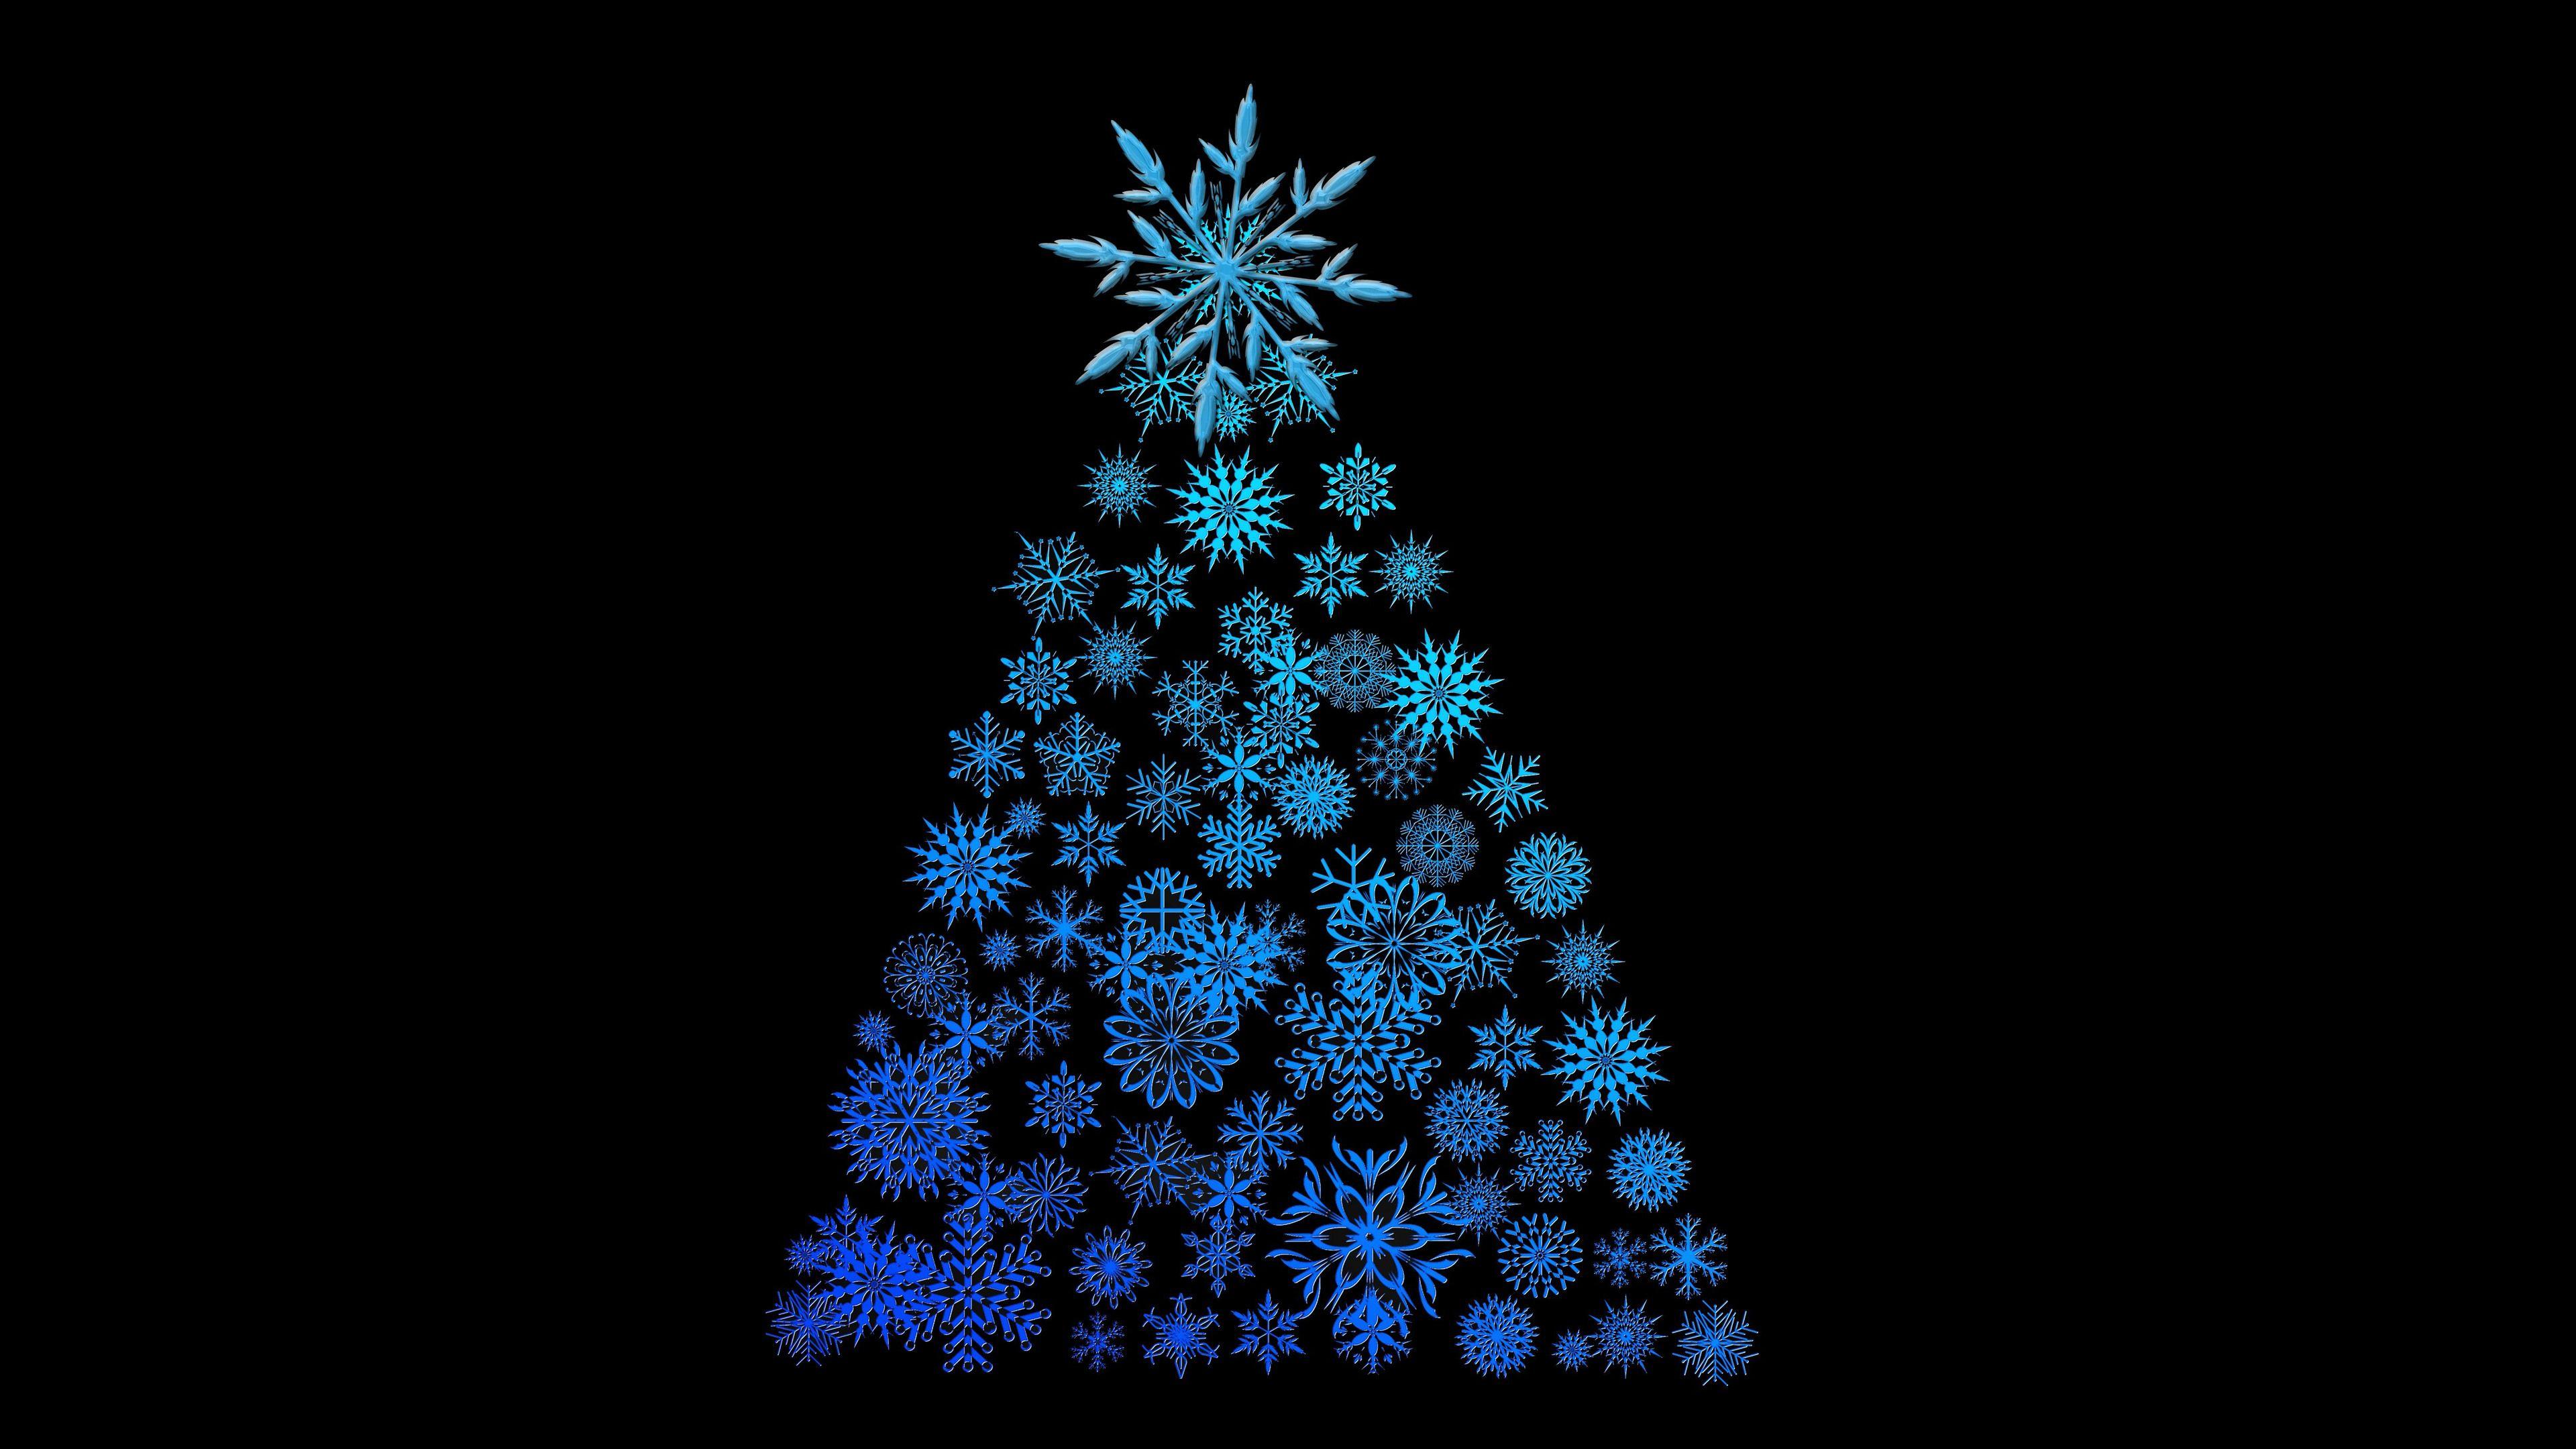 Christmas Tree Digital Art 4k Tree Wallpapers Minimalism Wallpapers Holidays Wallpapers Hd Wallpapers Digit Xmas Wallpaper Tree Wallpaper Holiday Wallpaper